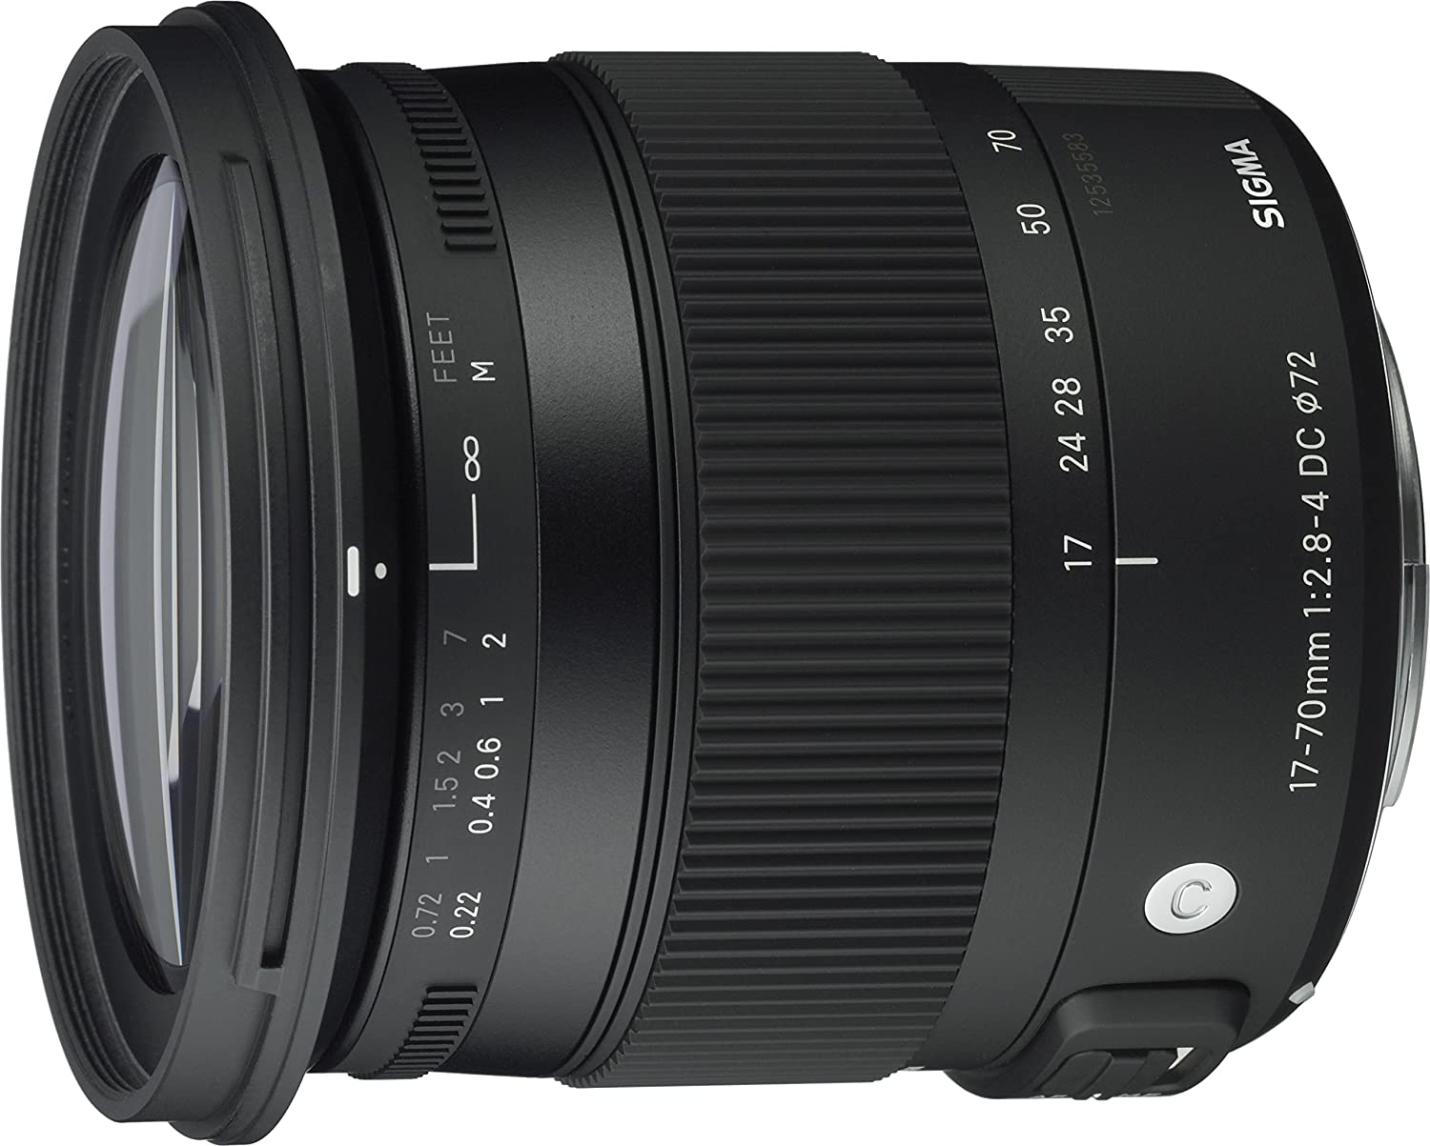 Best budget lens